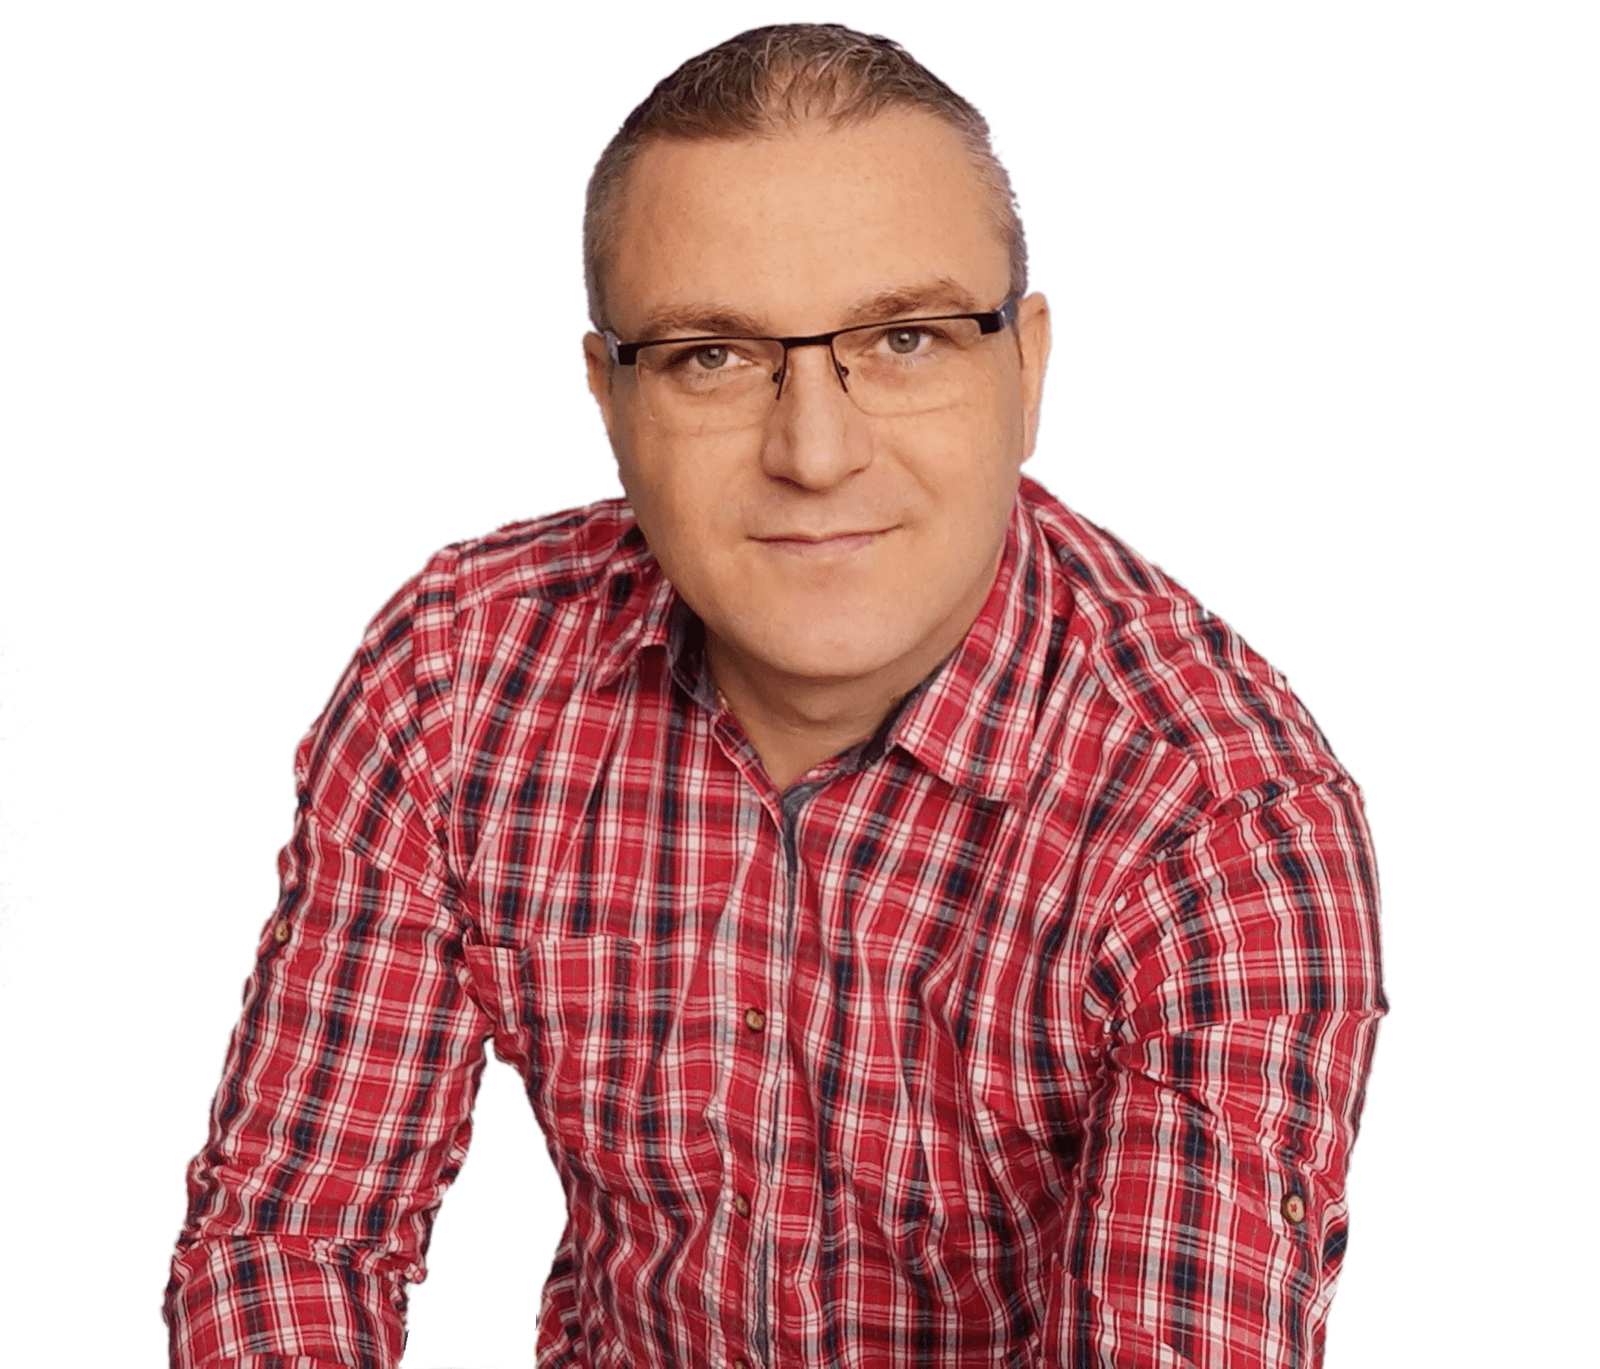 Robert Sobolewski